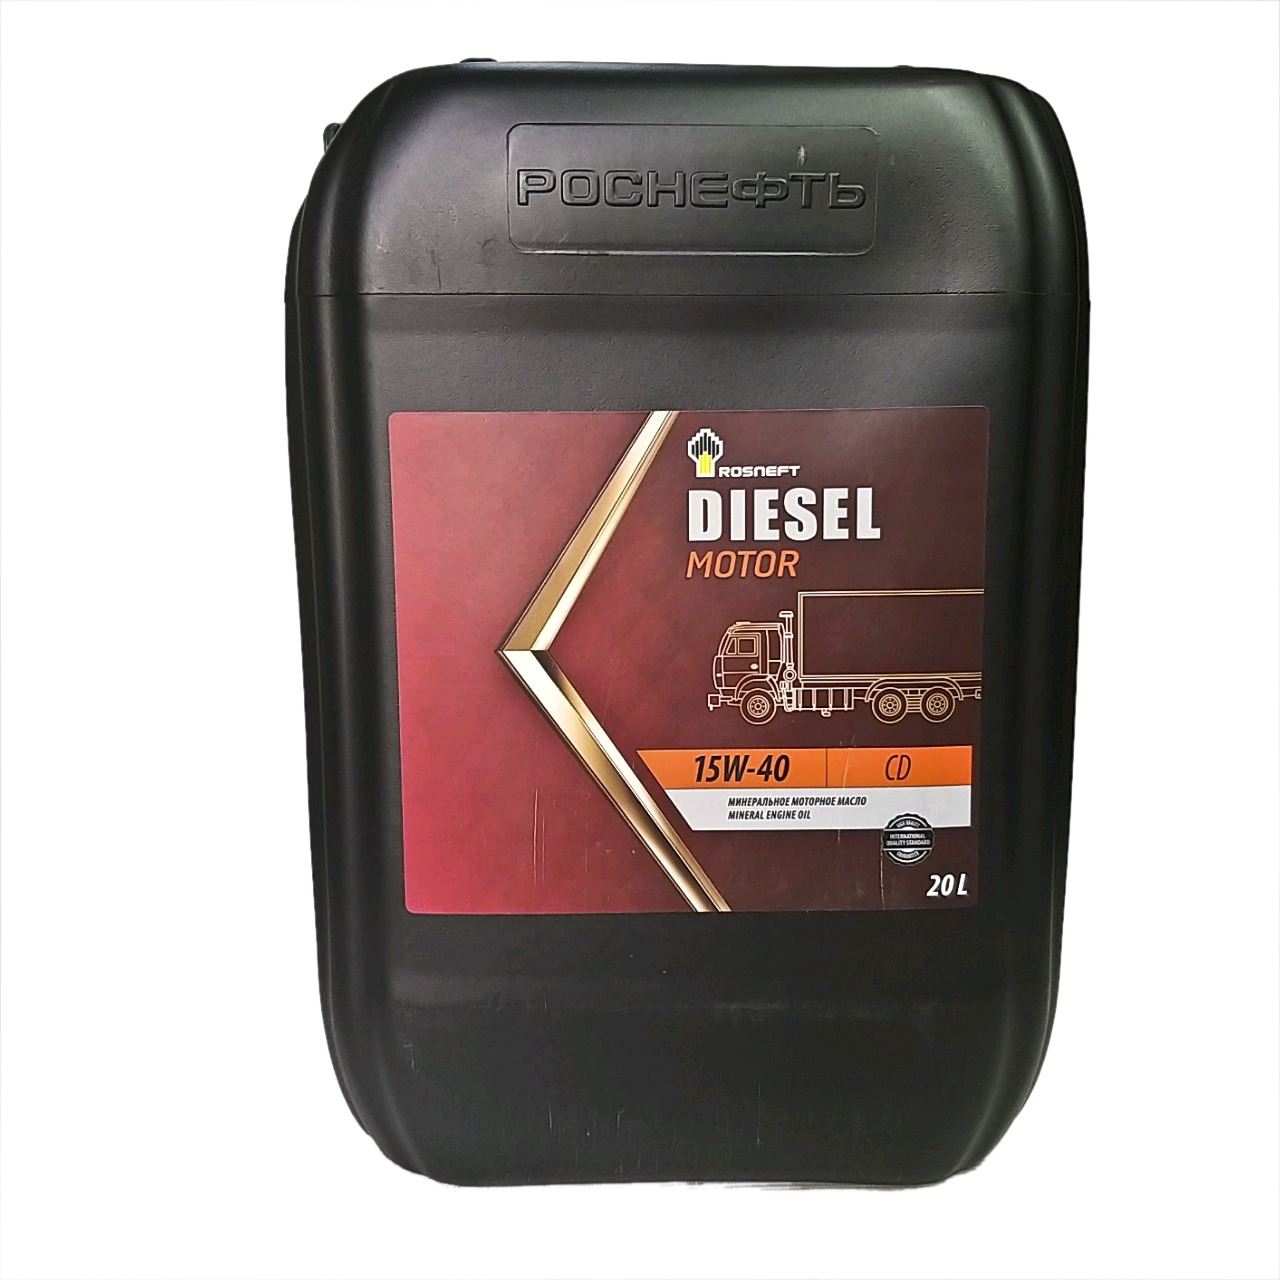 Rosneft Diesel Motor 15w-40 (20 L.)